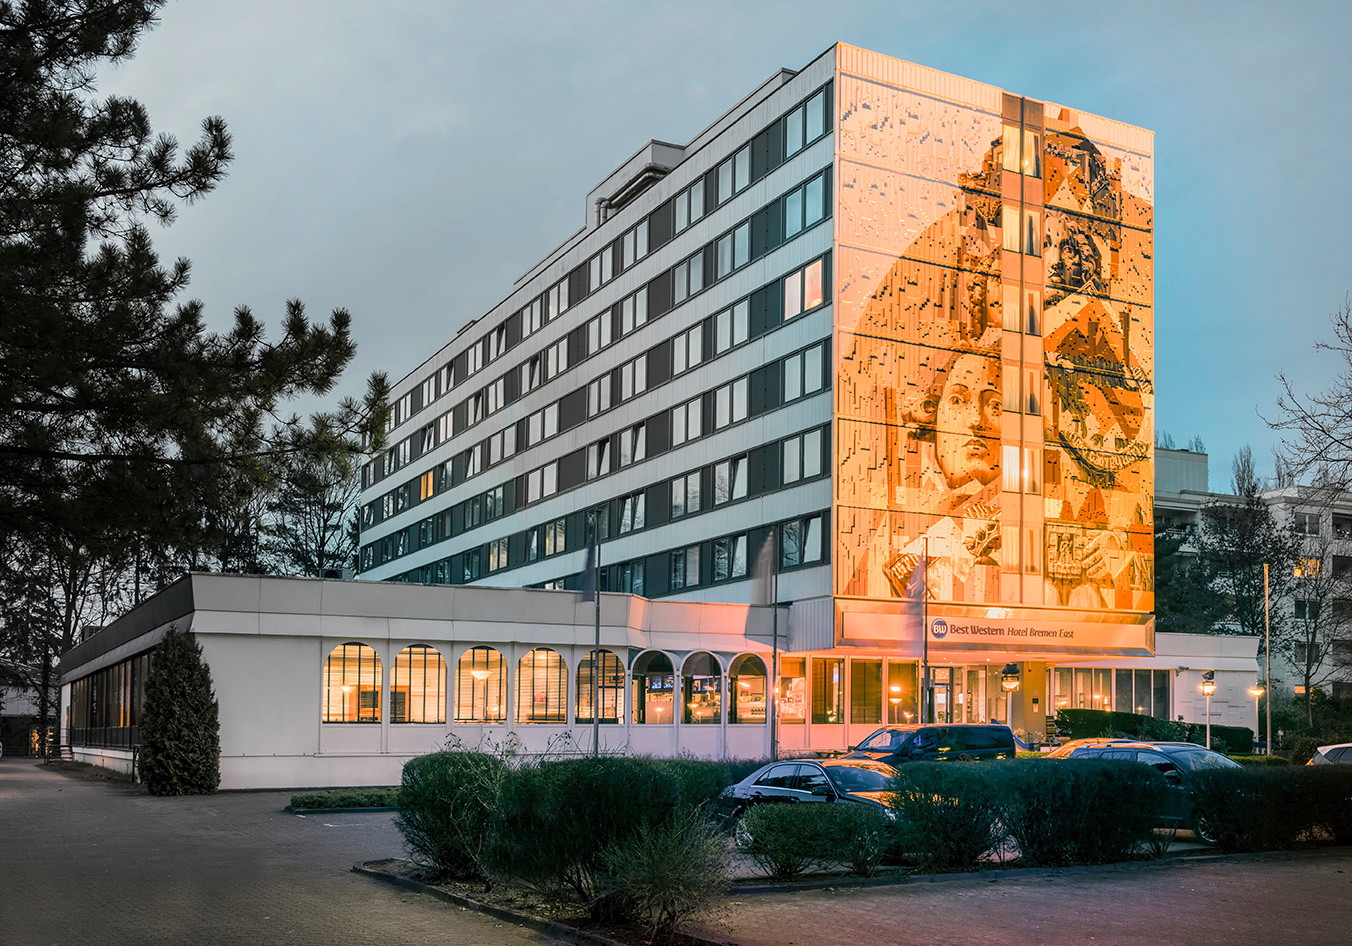 Bremen Casino